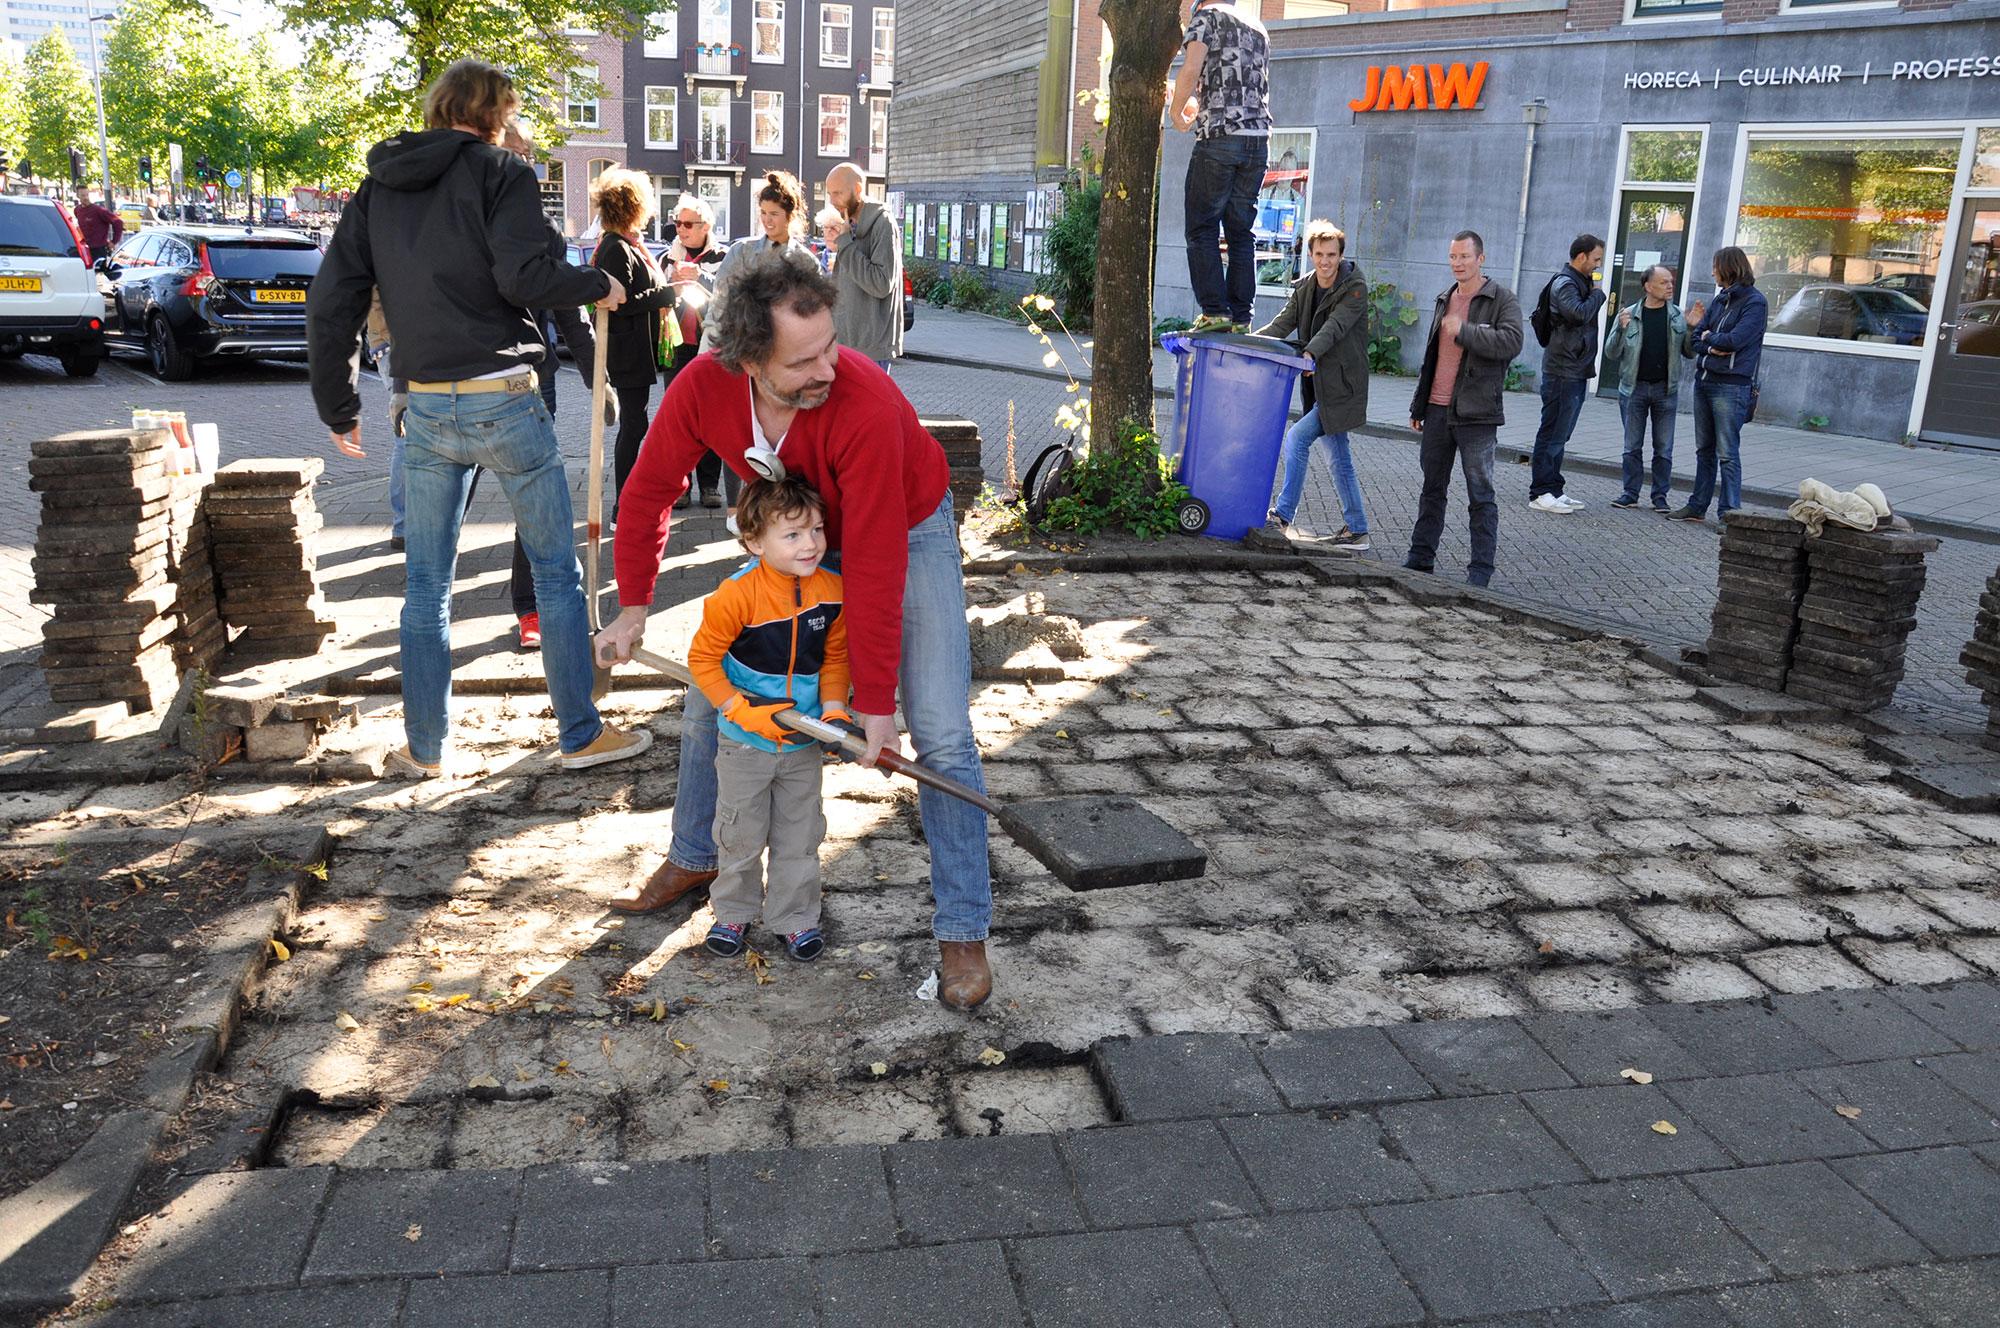 Park om de Hoek - Groene buurtparken en pleinen in Amsterdam